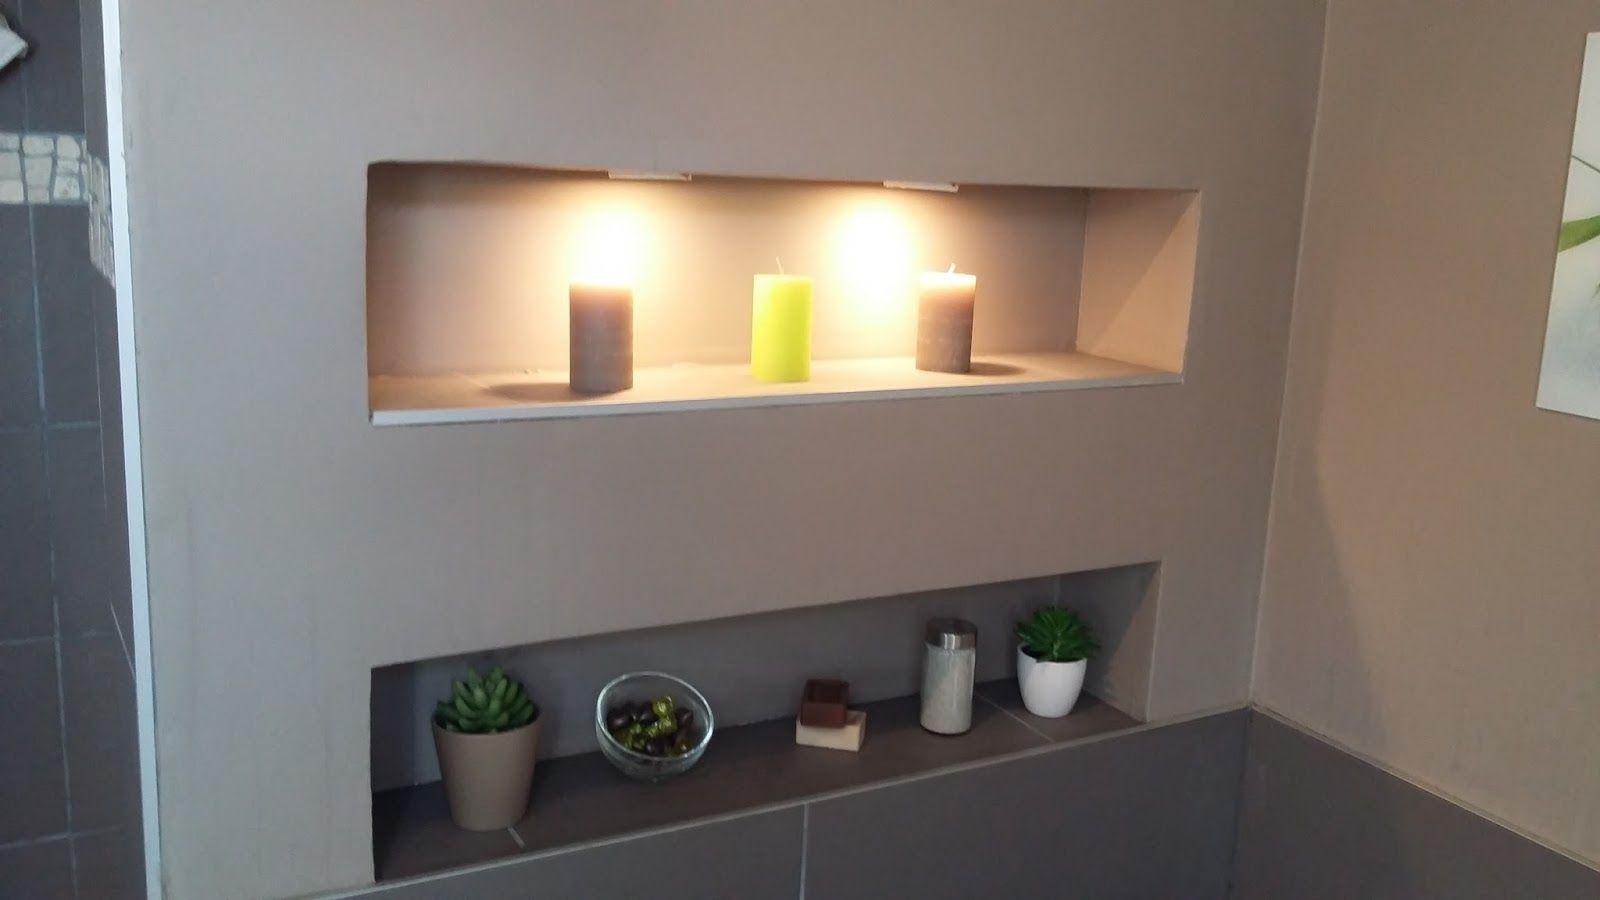 salle de bain zen nature moderne design taupe galet niche intégré ...